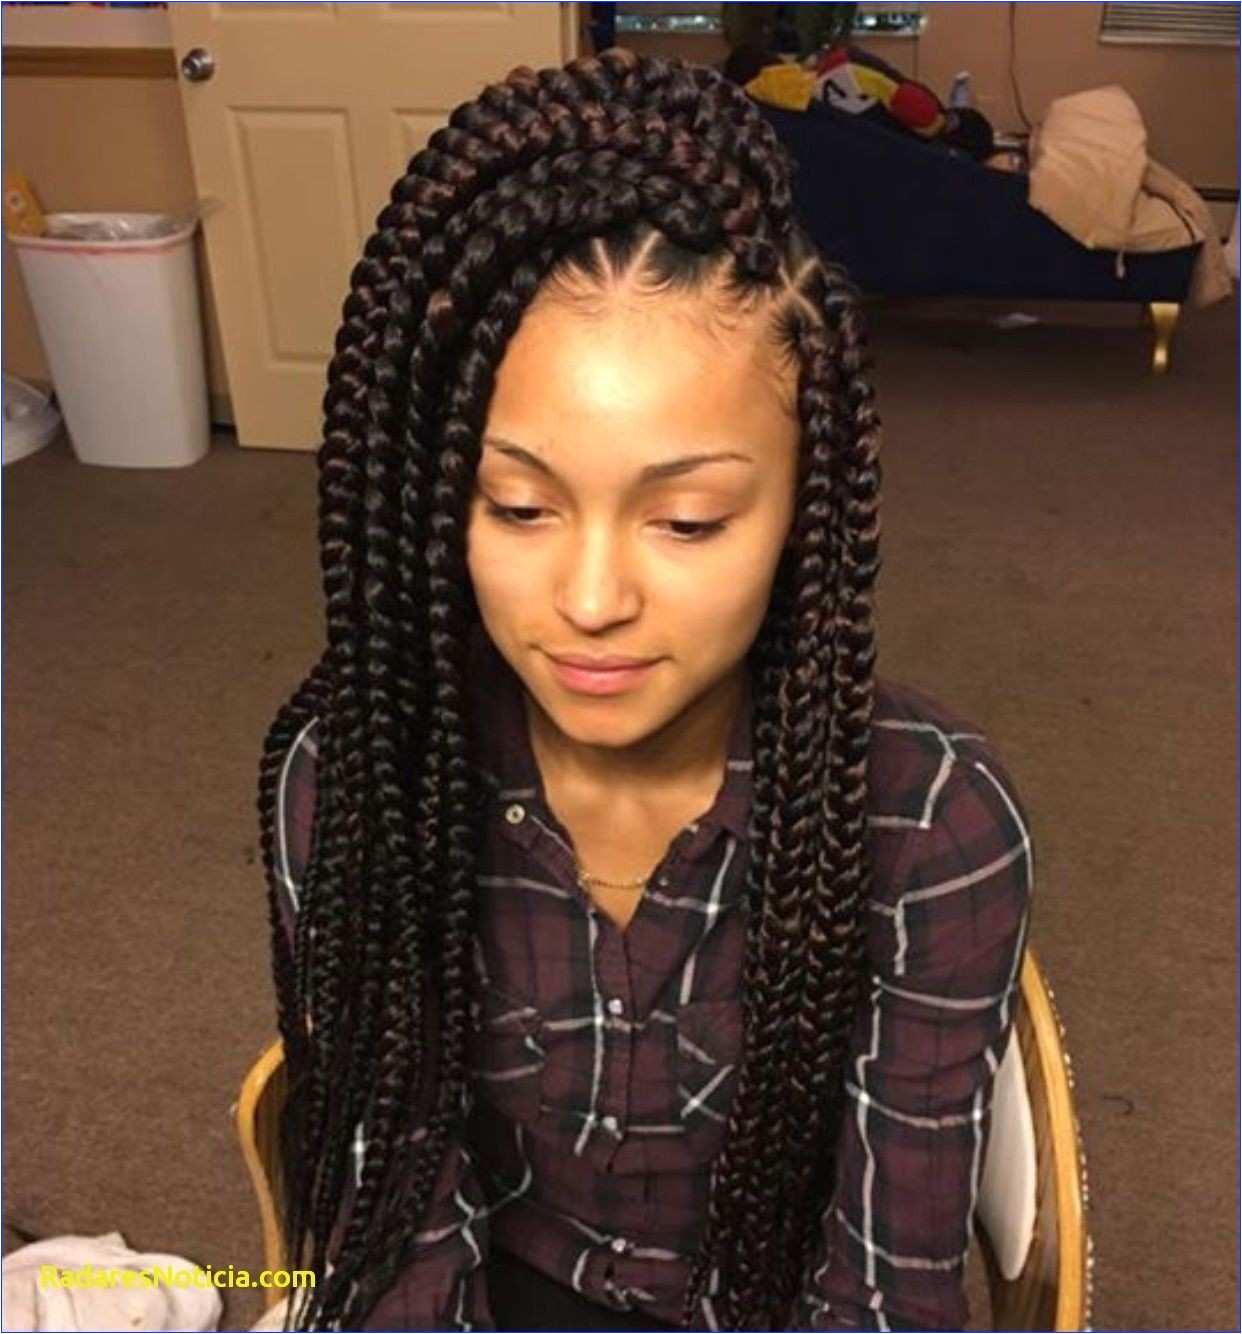 Cute Girl Braided Hairstyles Elegant Lovely Kids Braided Hairstyles with Beads Hairstyle Ideas Cute Girl